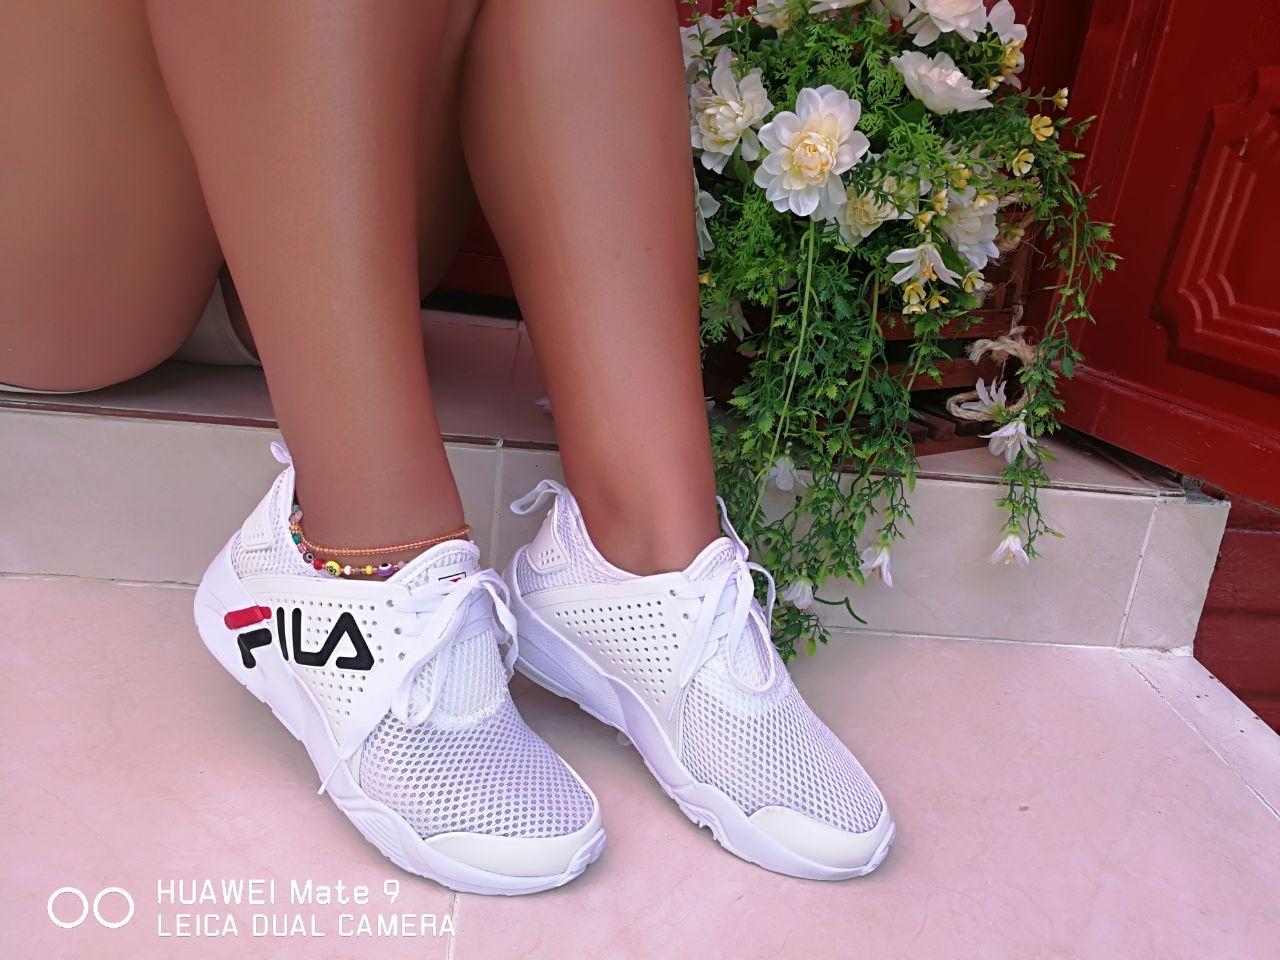 5b2a14f6 Pin by reathea jordan on Shoes in 2019 | Zapatos, Zapatos de chicas ...